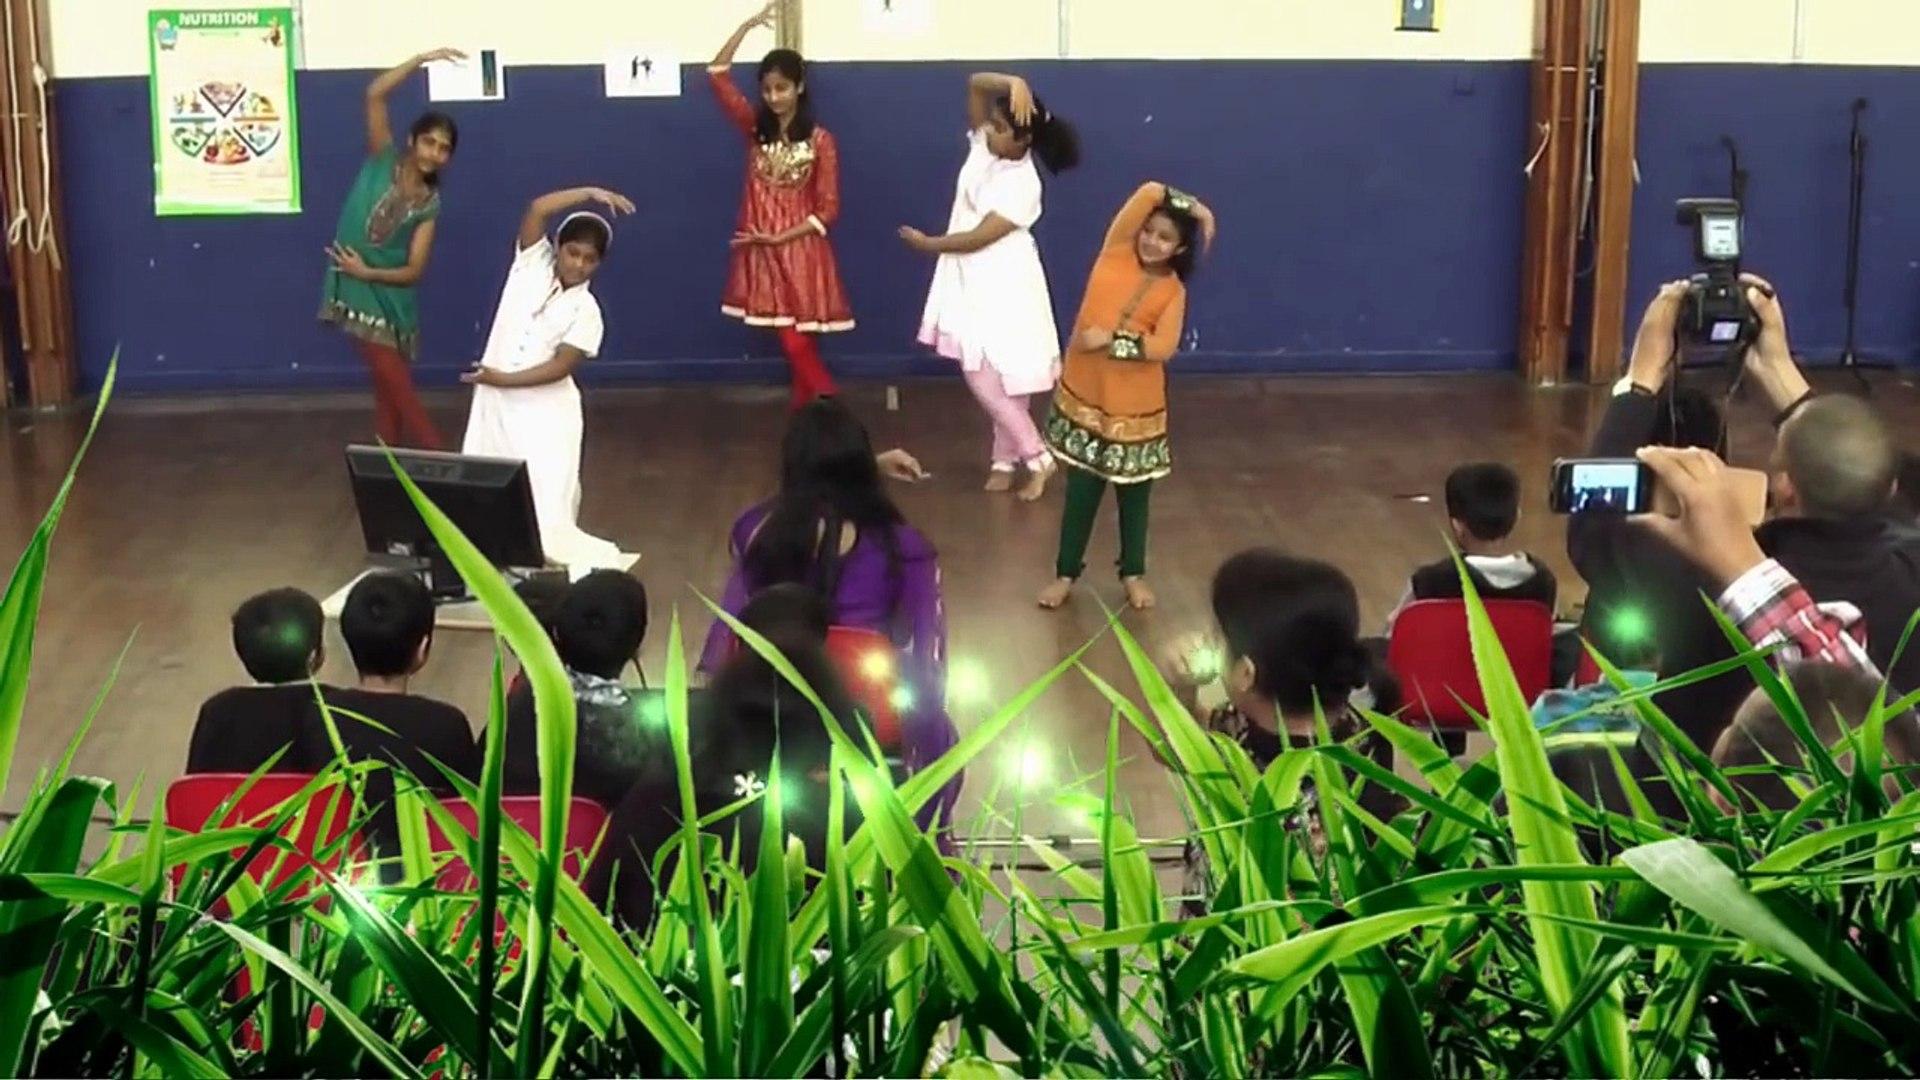 London Pentecostal Church Sunday school children's action song  2012